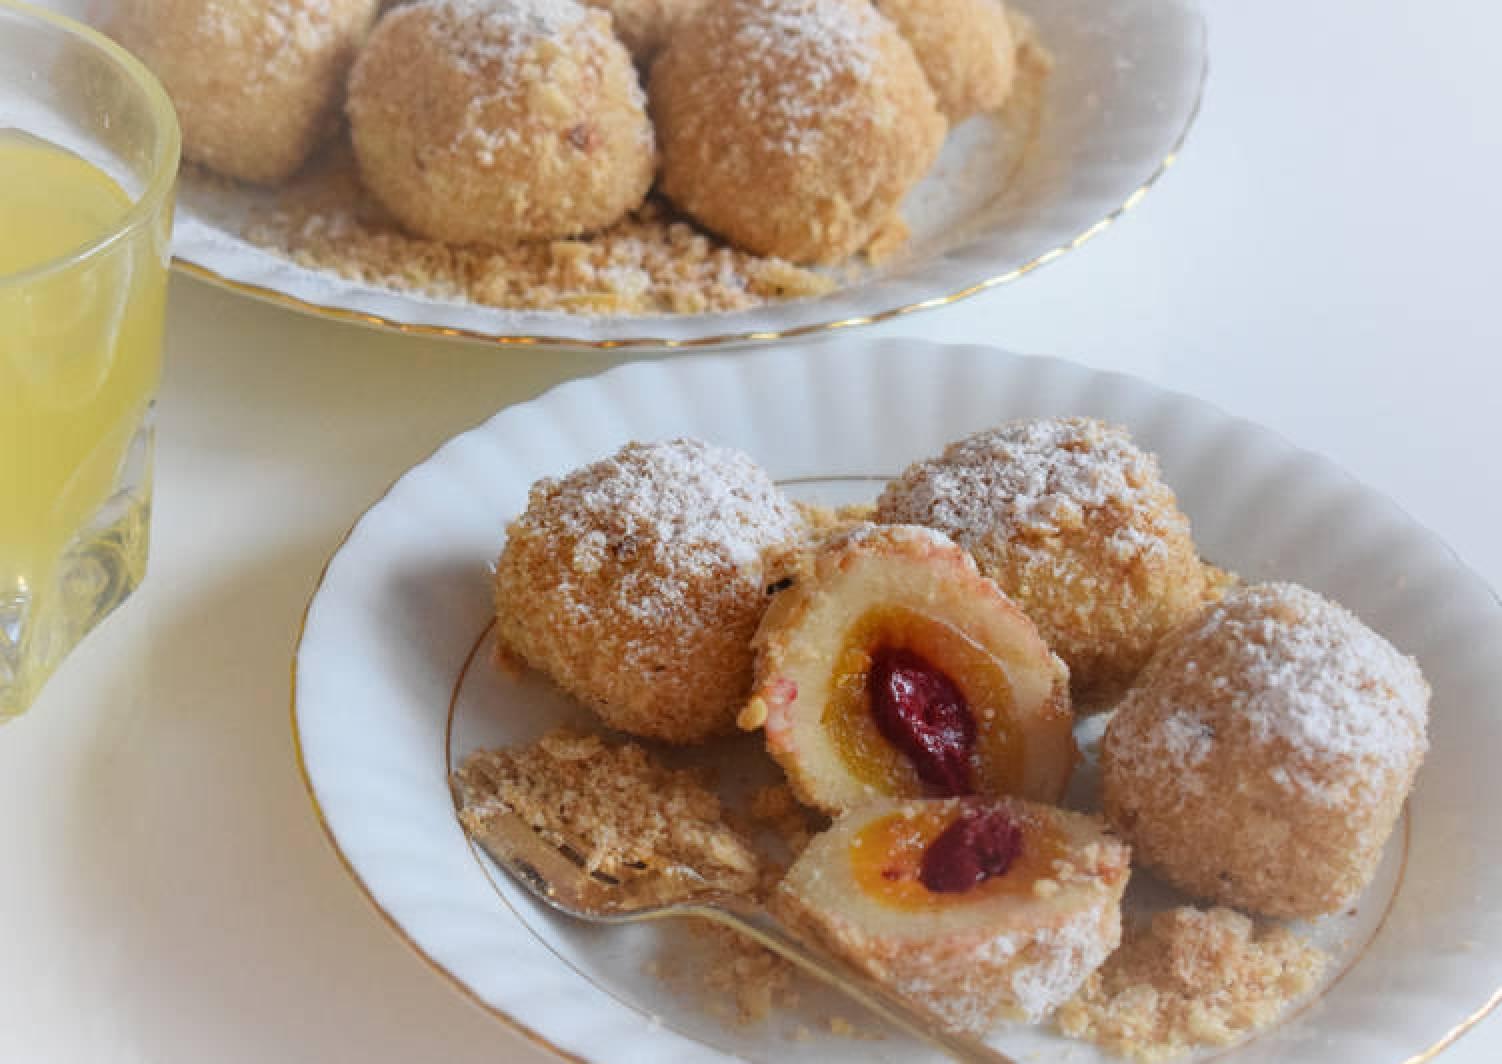 Apricot / cherry dumplings rolled in roasted almond breadcrumbs